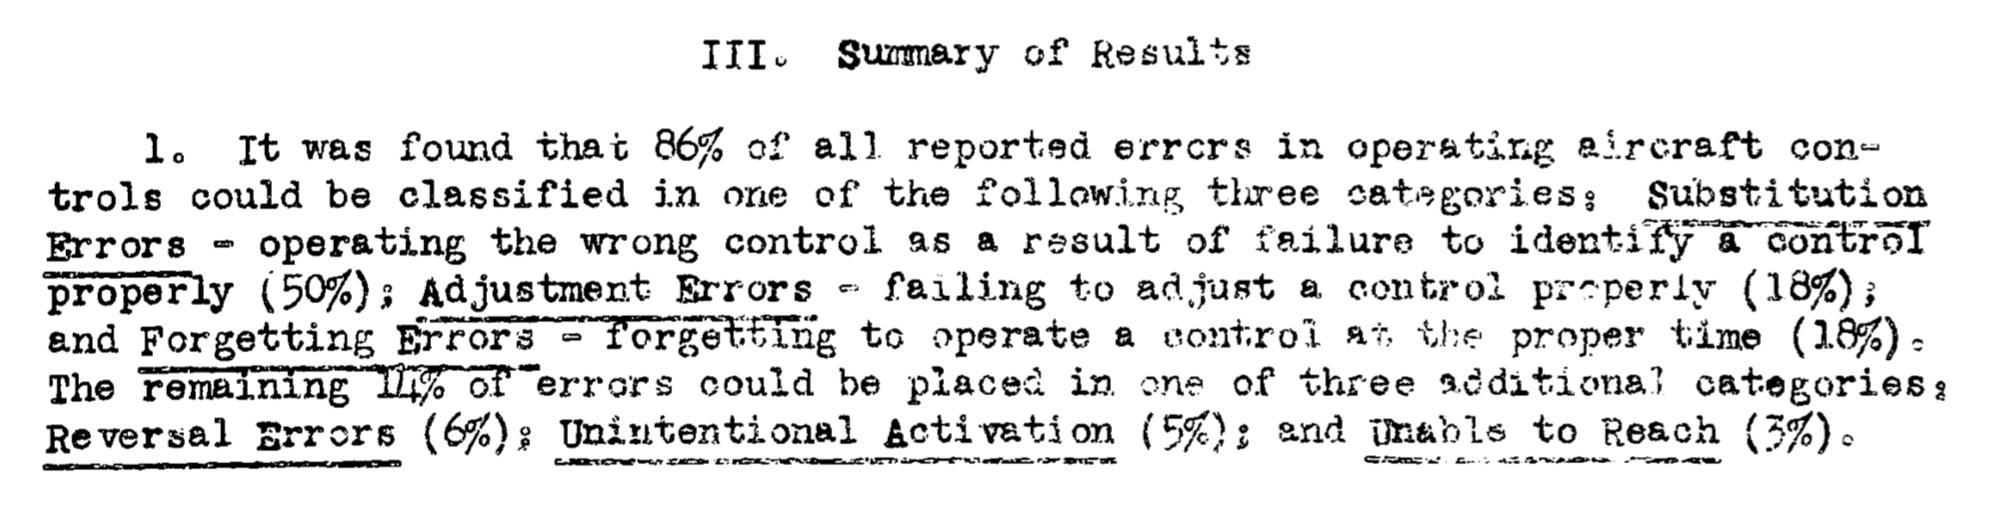 army report uniformity